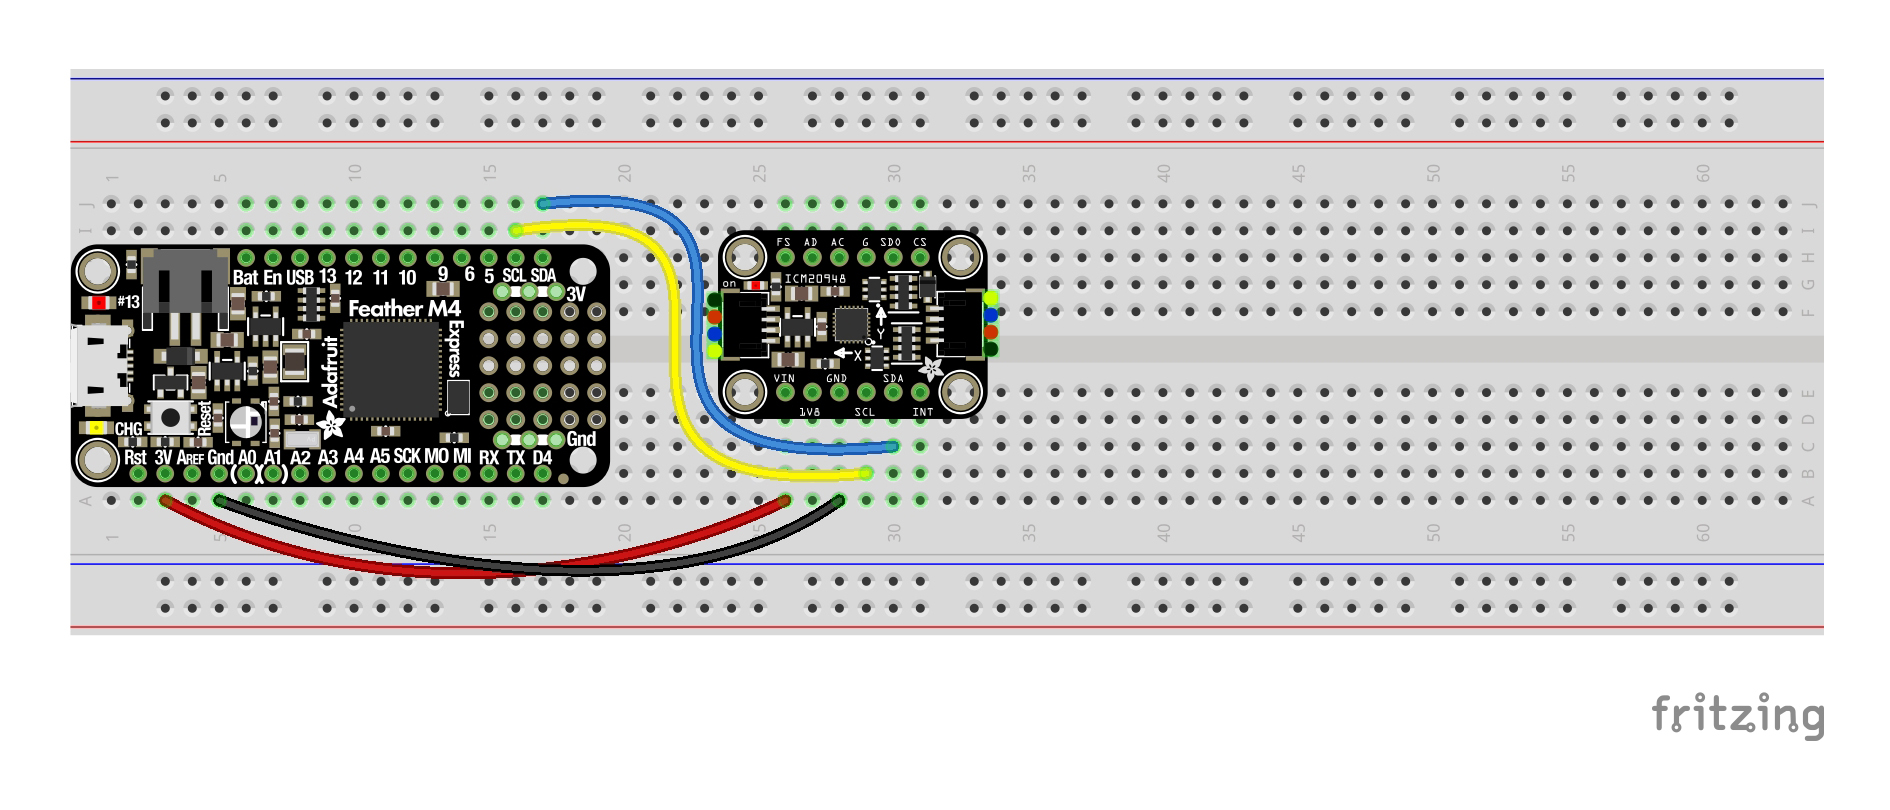 sensors_ICM20948_FeatherM4_breadboard_bb.jpg